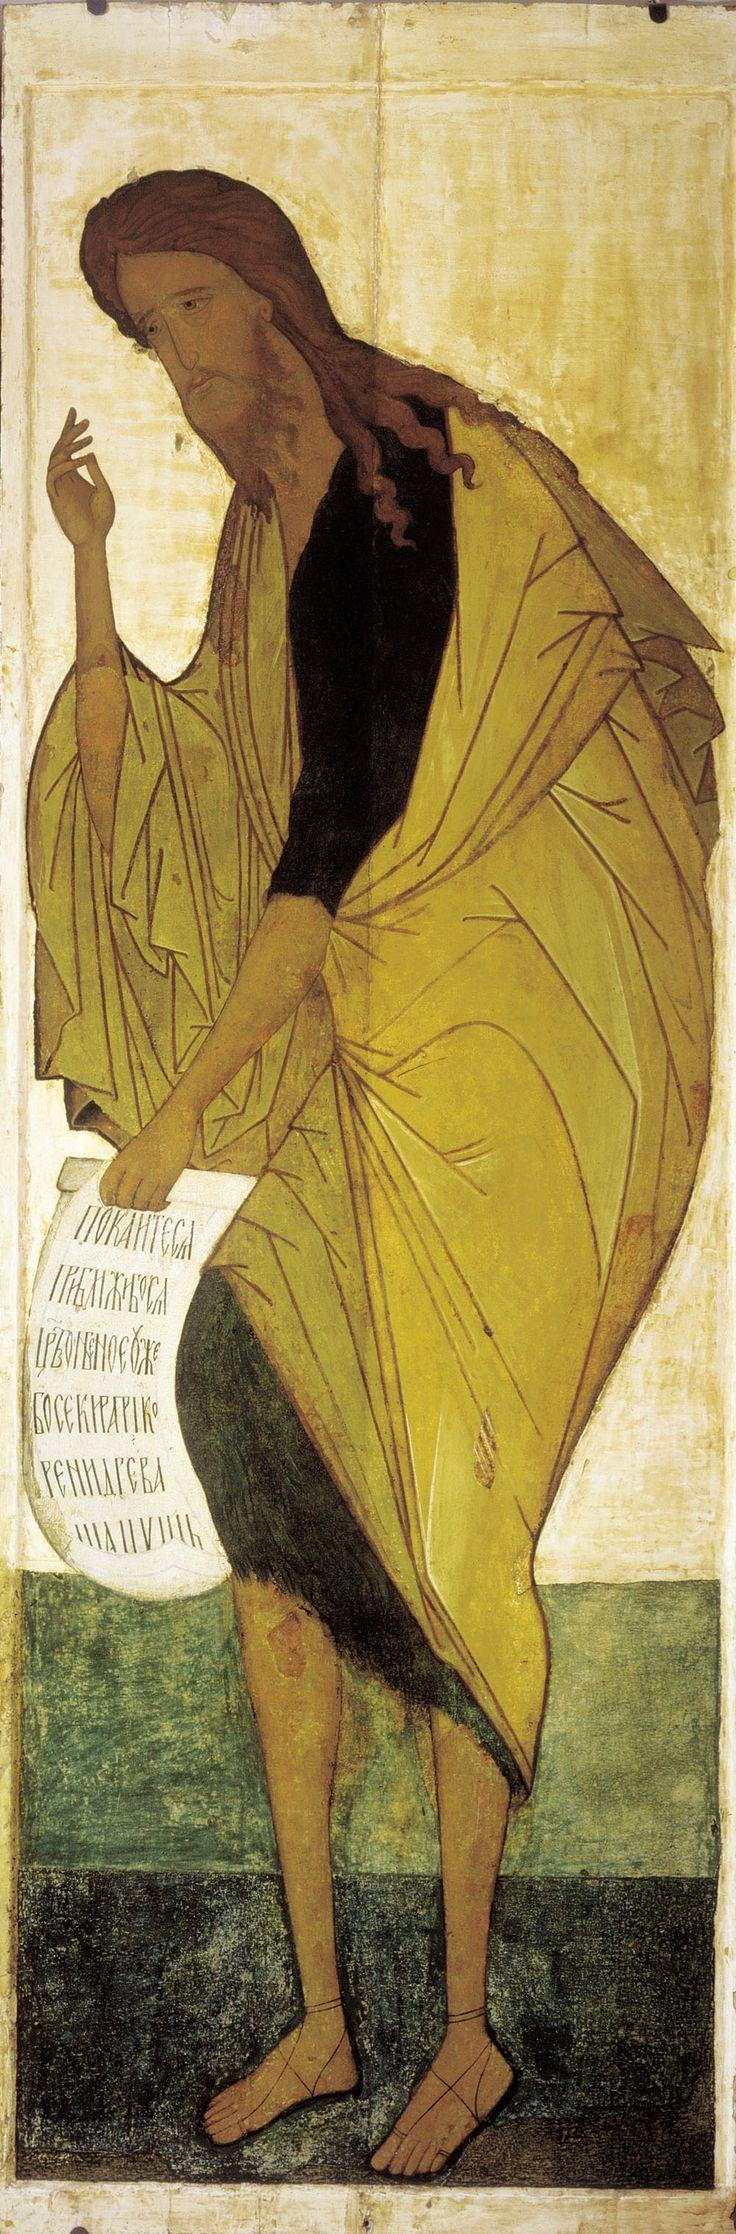 Andrei Rublev, Saint John the Baptist. 1408